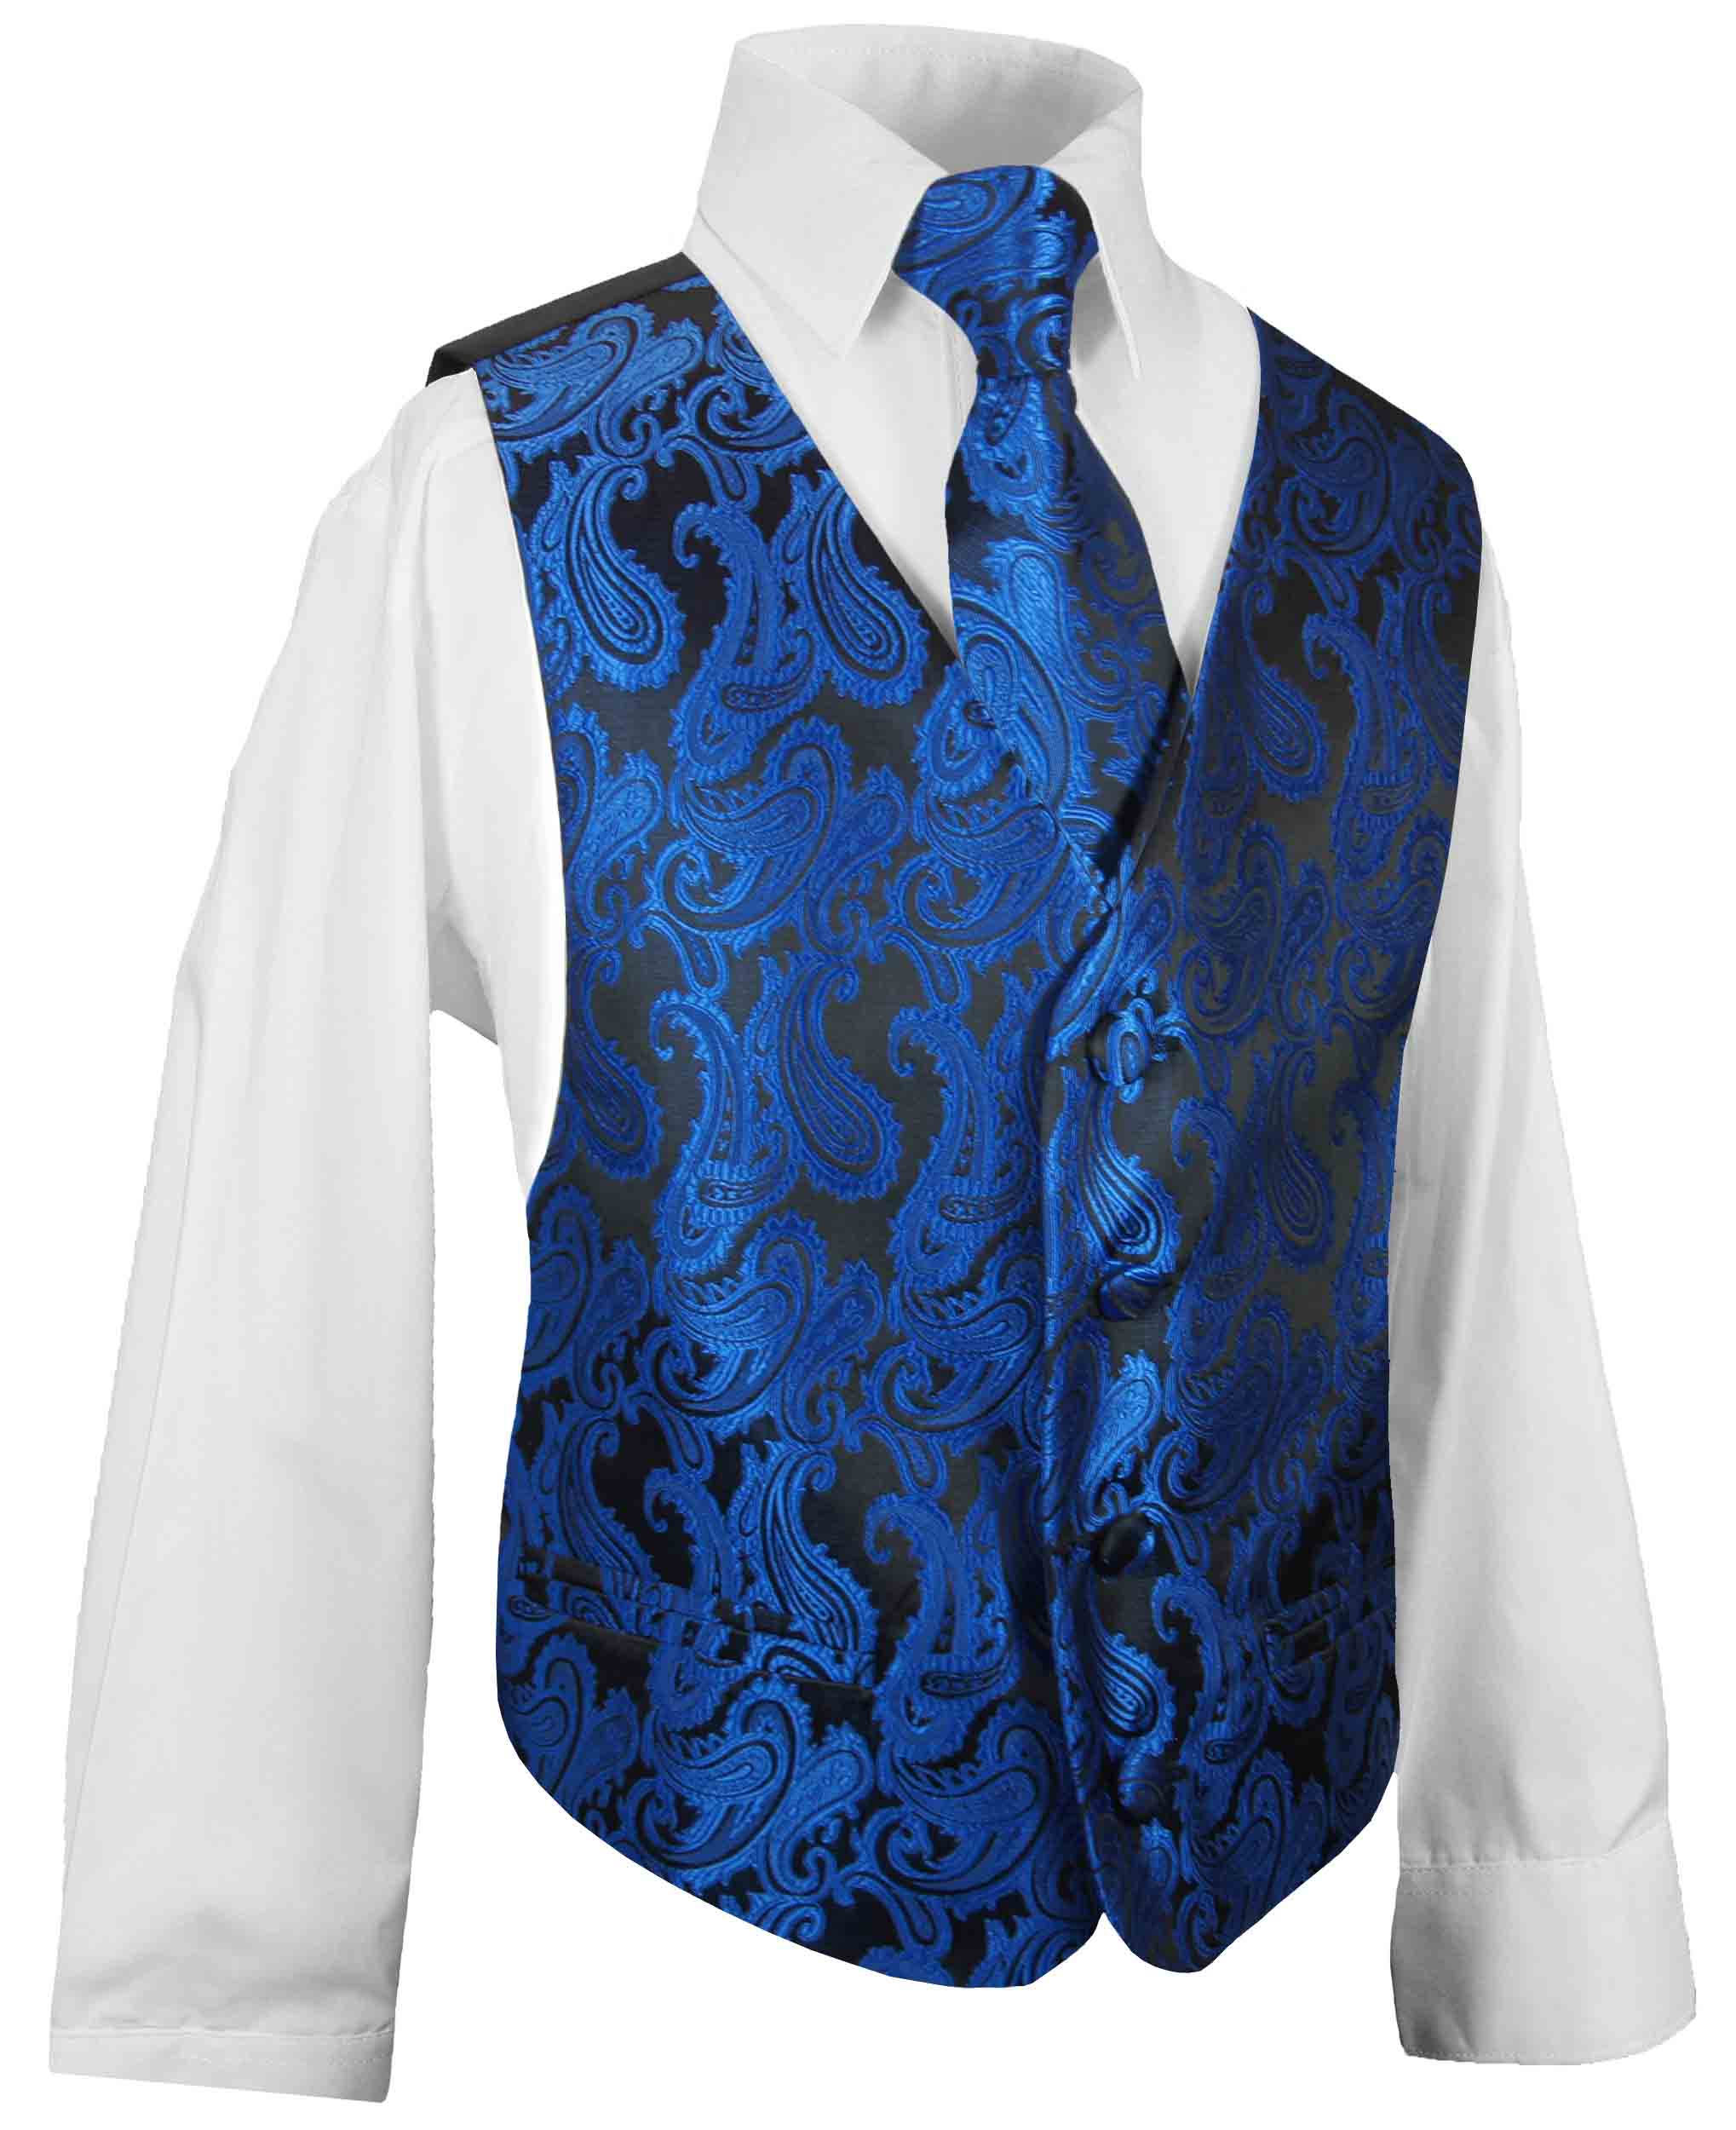 kinderanzug festlich blau blaue weste paul malone shop. Black Bedroom Furniture Sets. Home Design Ideas